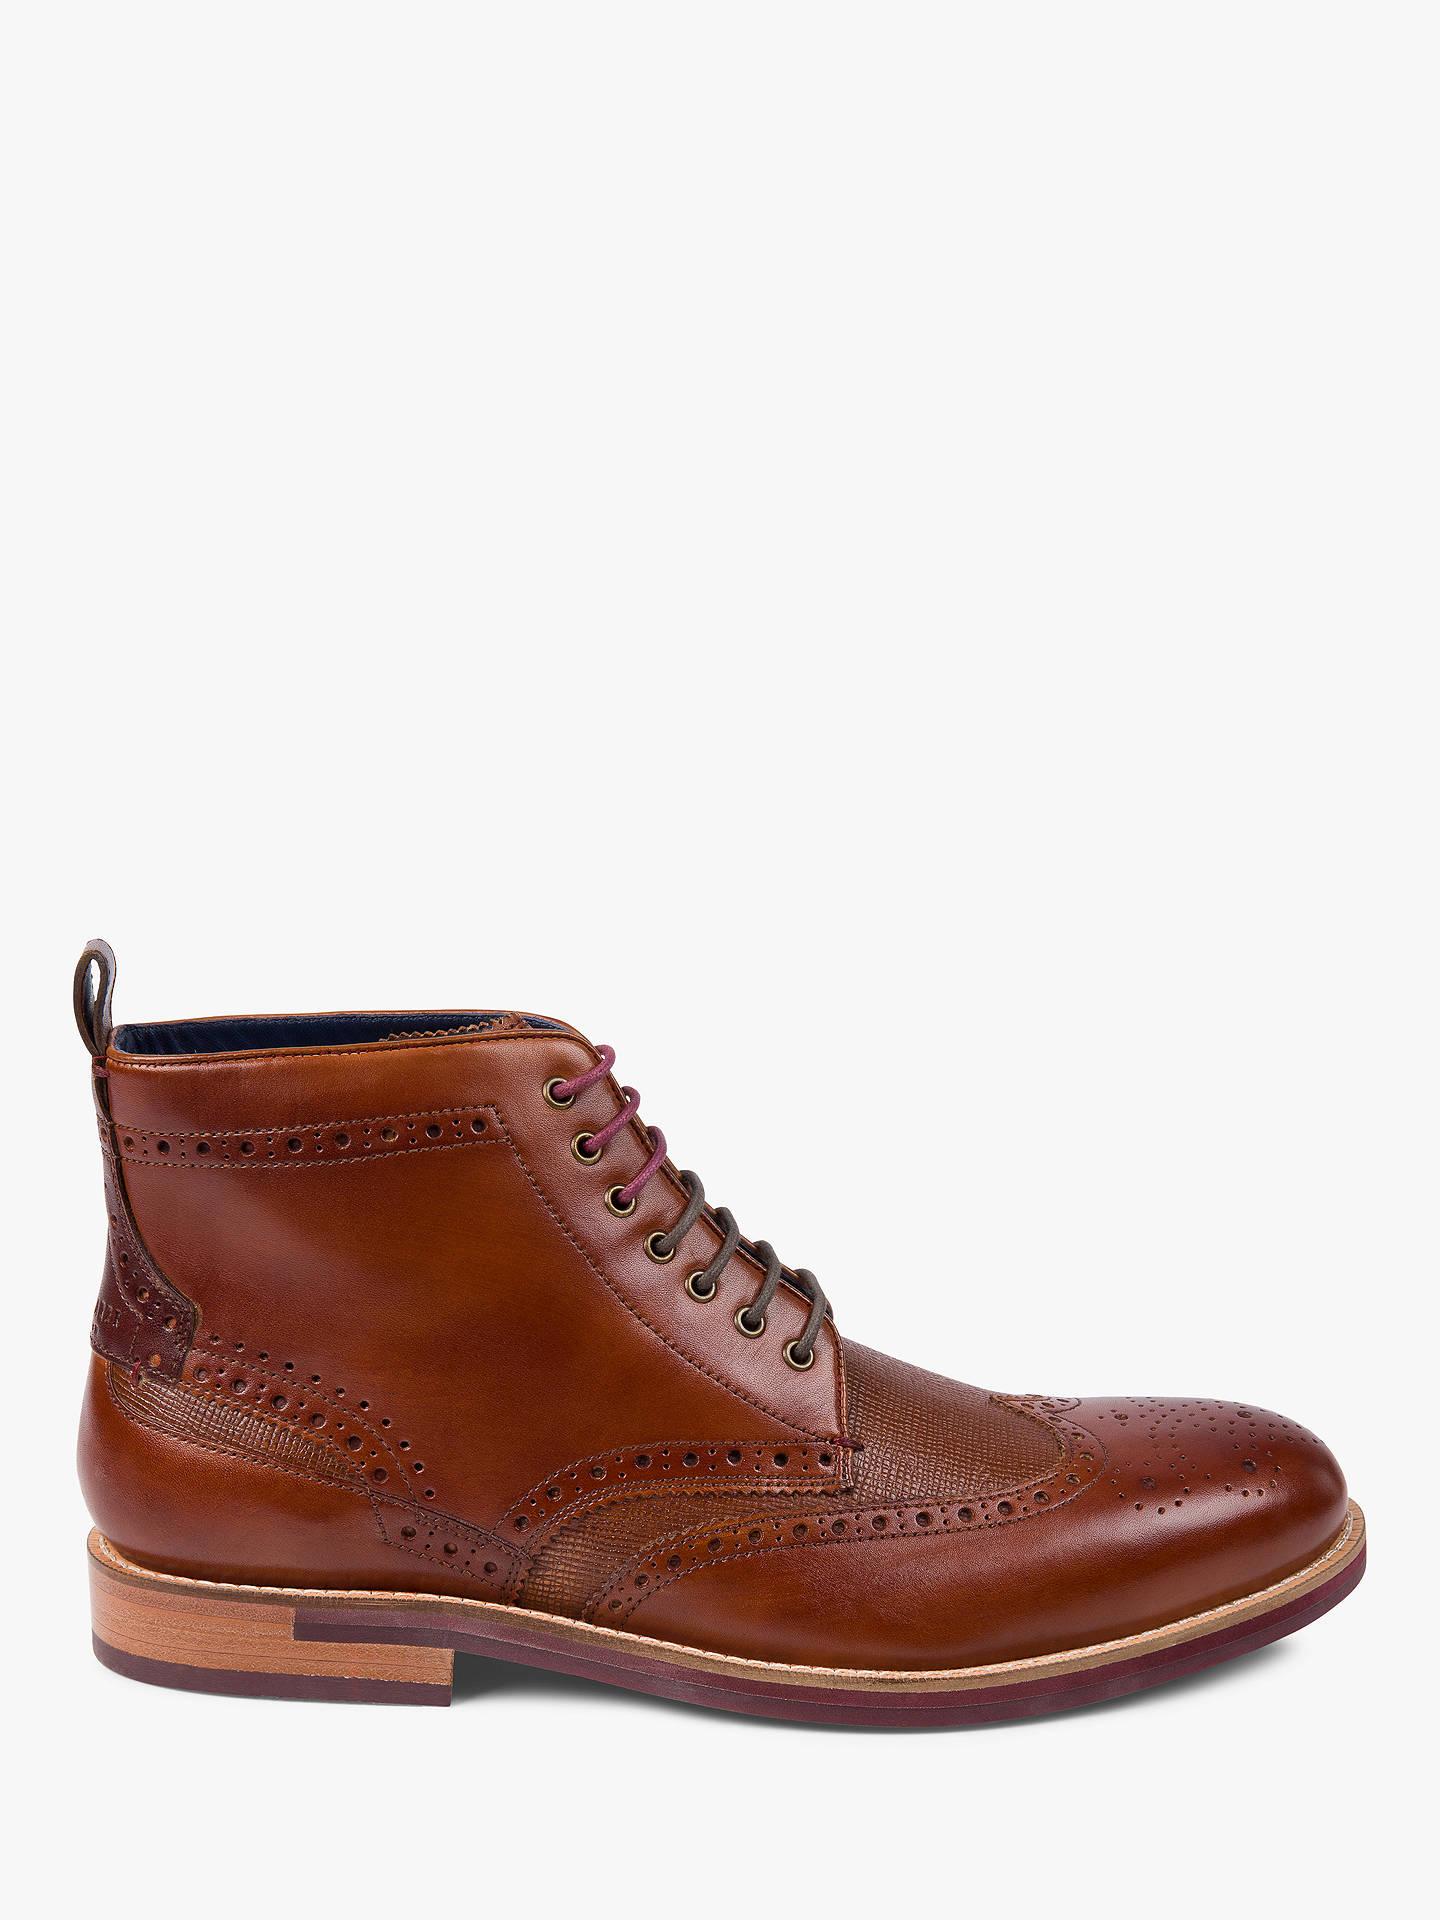 0b1edd0441ef Buy Ted Baker Hjenno Brogue Boots